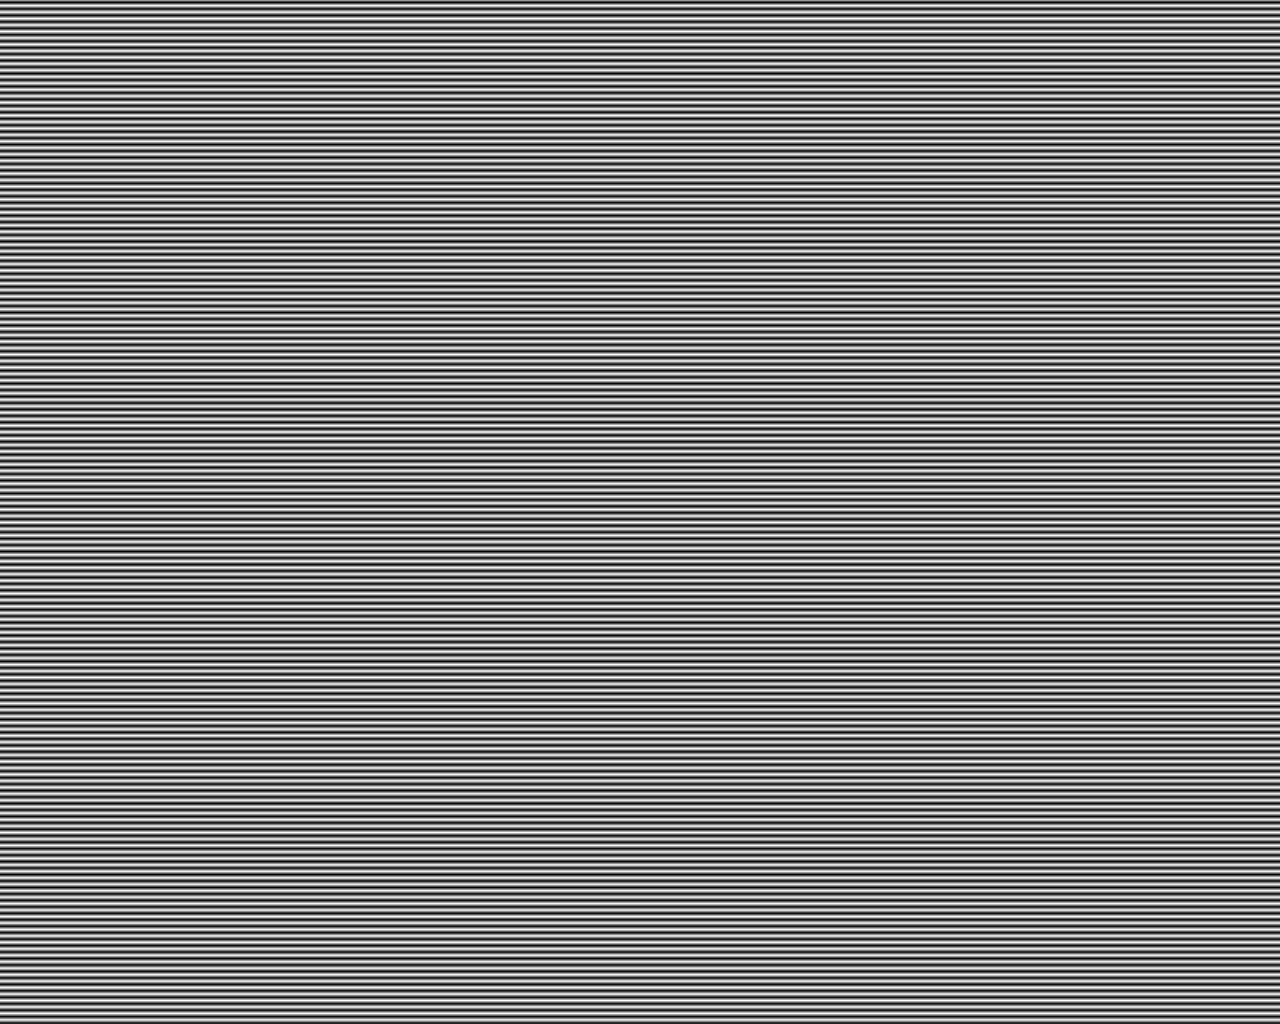 Scanlines Namantuts Jpg Mediafire Screentone Overlays Transparent Overlays Tumblr